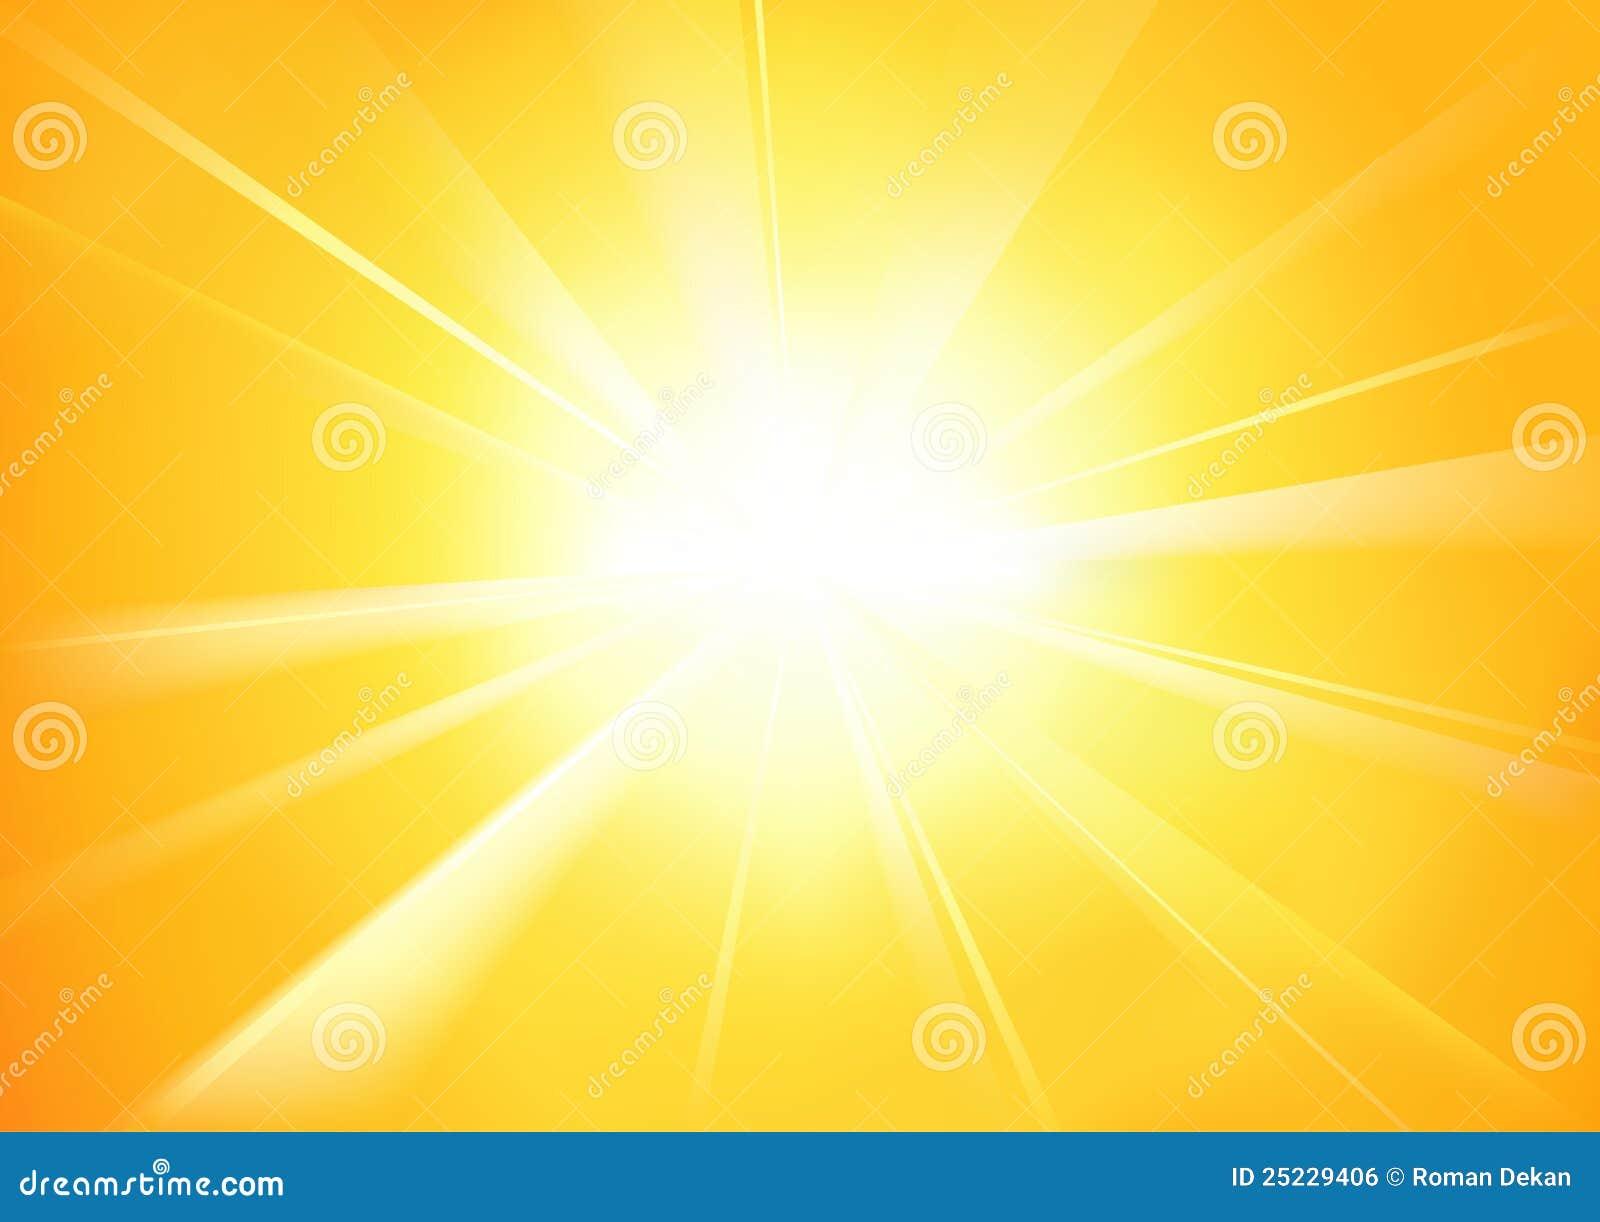 Sunshine Stock Vector. Illustration Of Beams, Sunshine